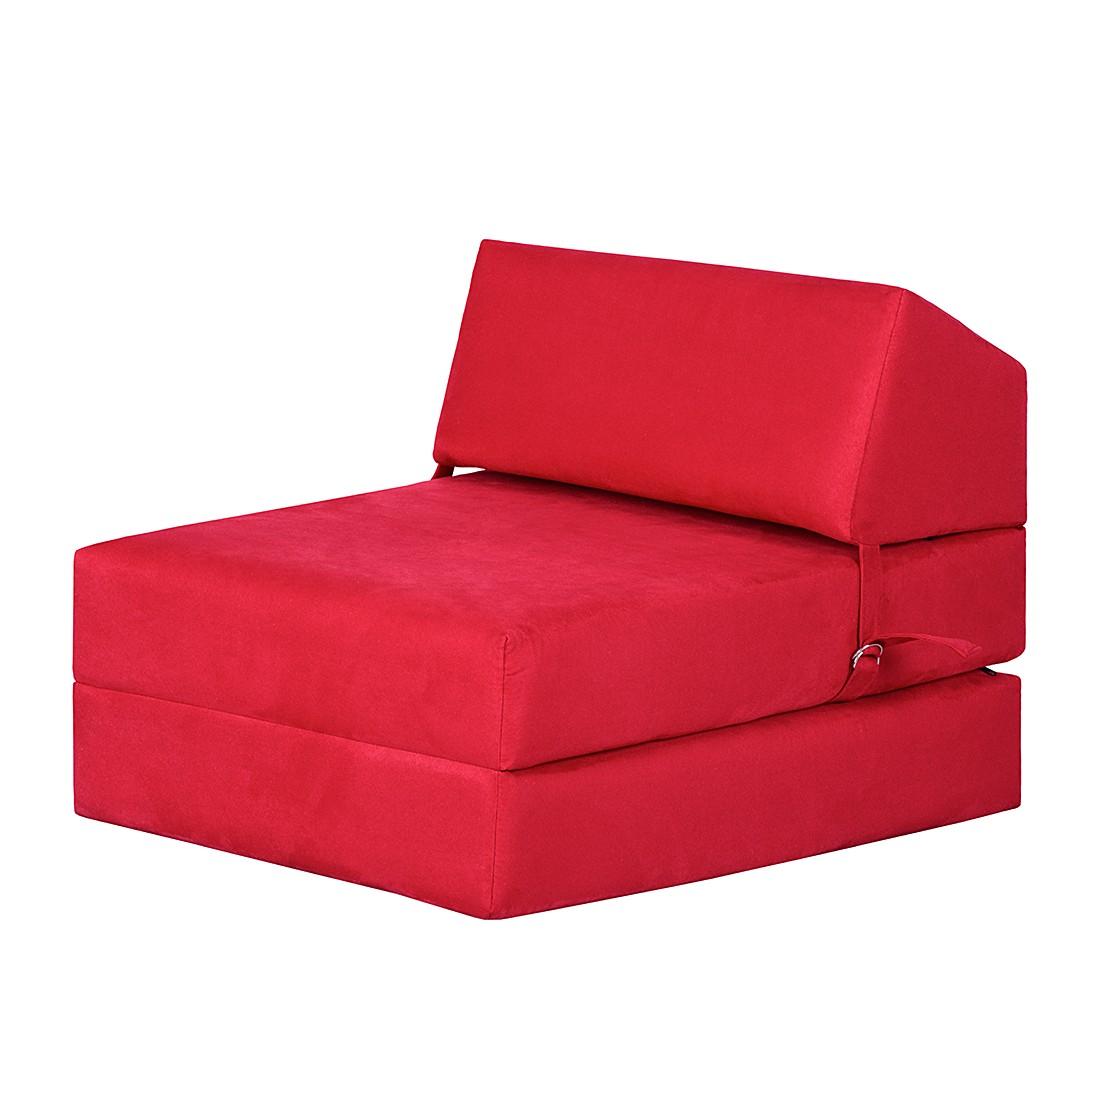 schlafsessel 783 angebote auf find. Black Bedroom Furniture Sets. Home Design Ideas